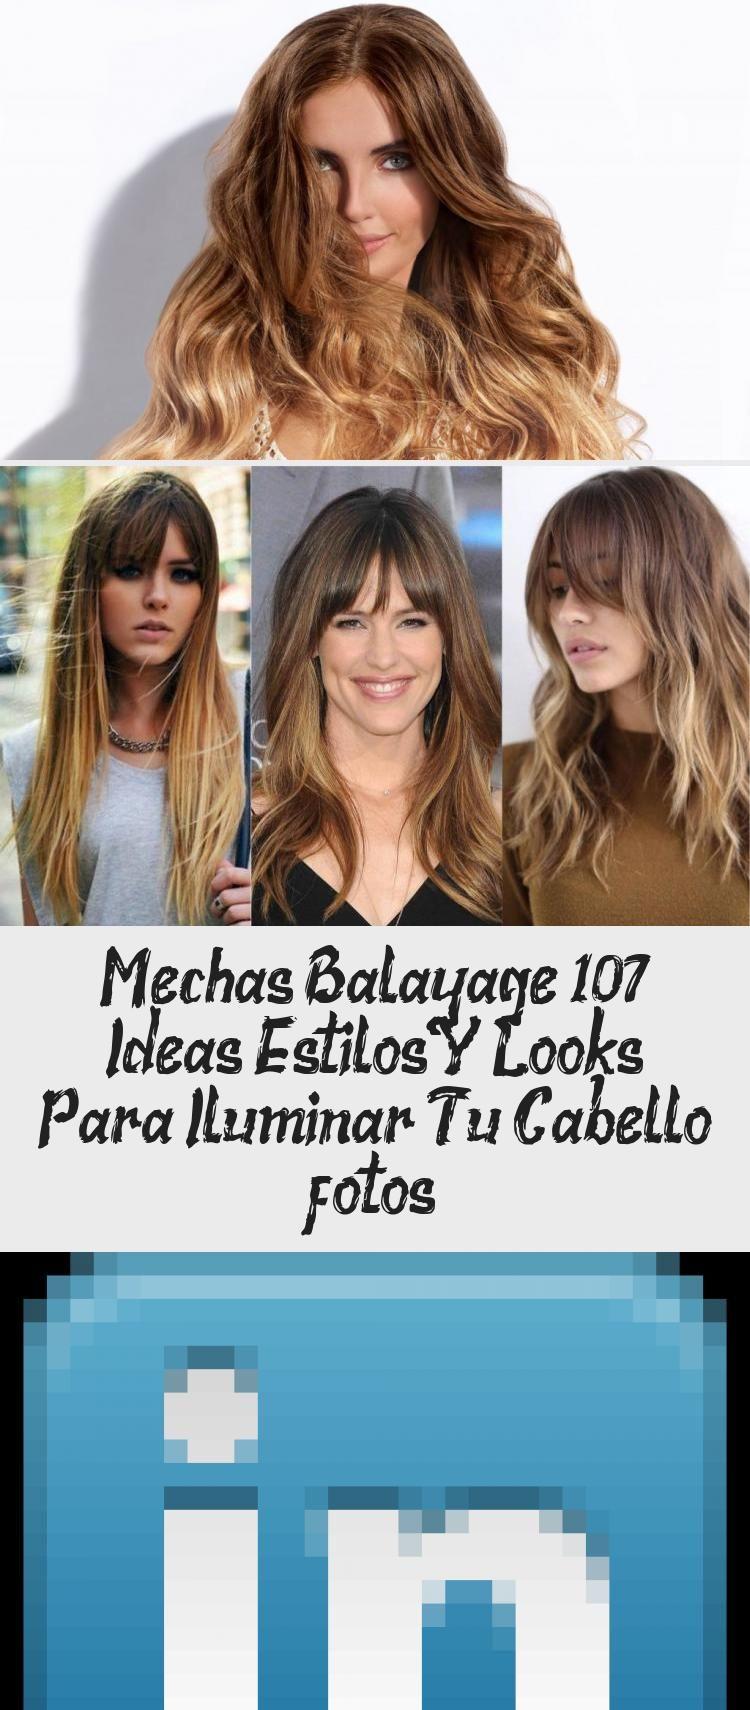 Mechas Balayage Caramelo Balayagehairnatural Balayagehairviolet Balayagehairwithbangs Balayagehairtutorial B In 2020 Balayage Hair Tutorial Balayage Balayage Hair